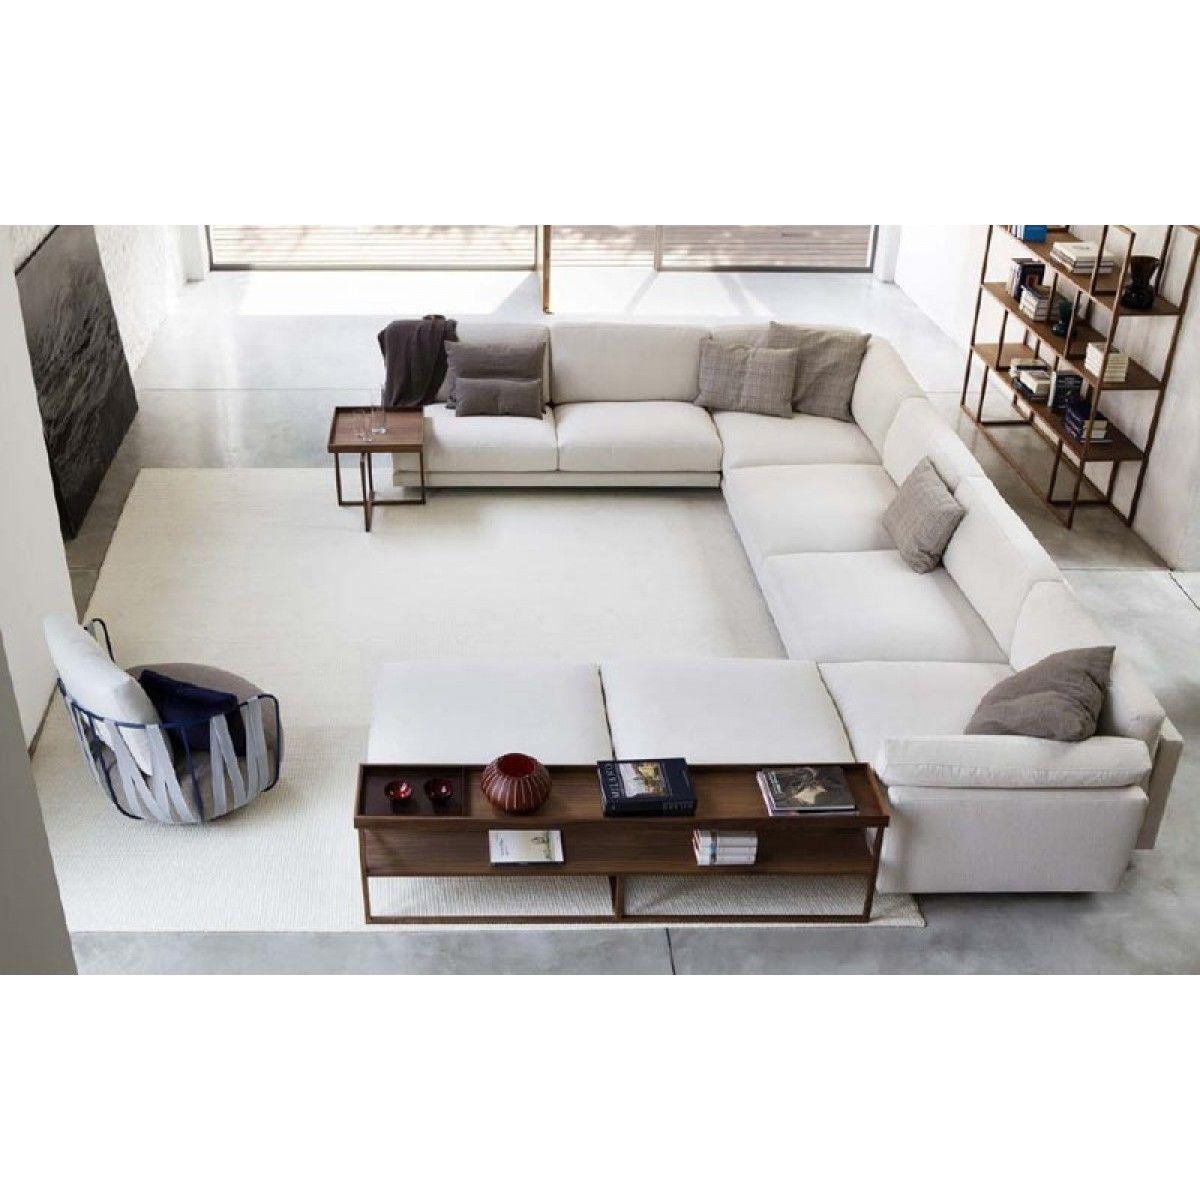 Extra Large Modular Sofa Large sofa bed, Elegant living